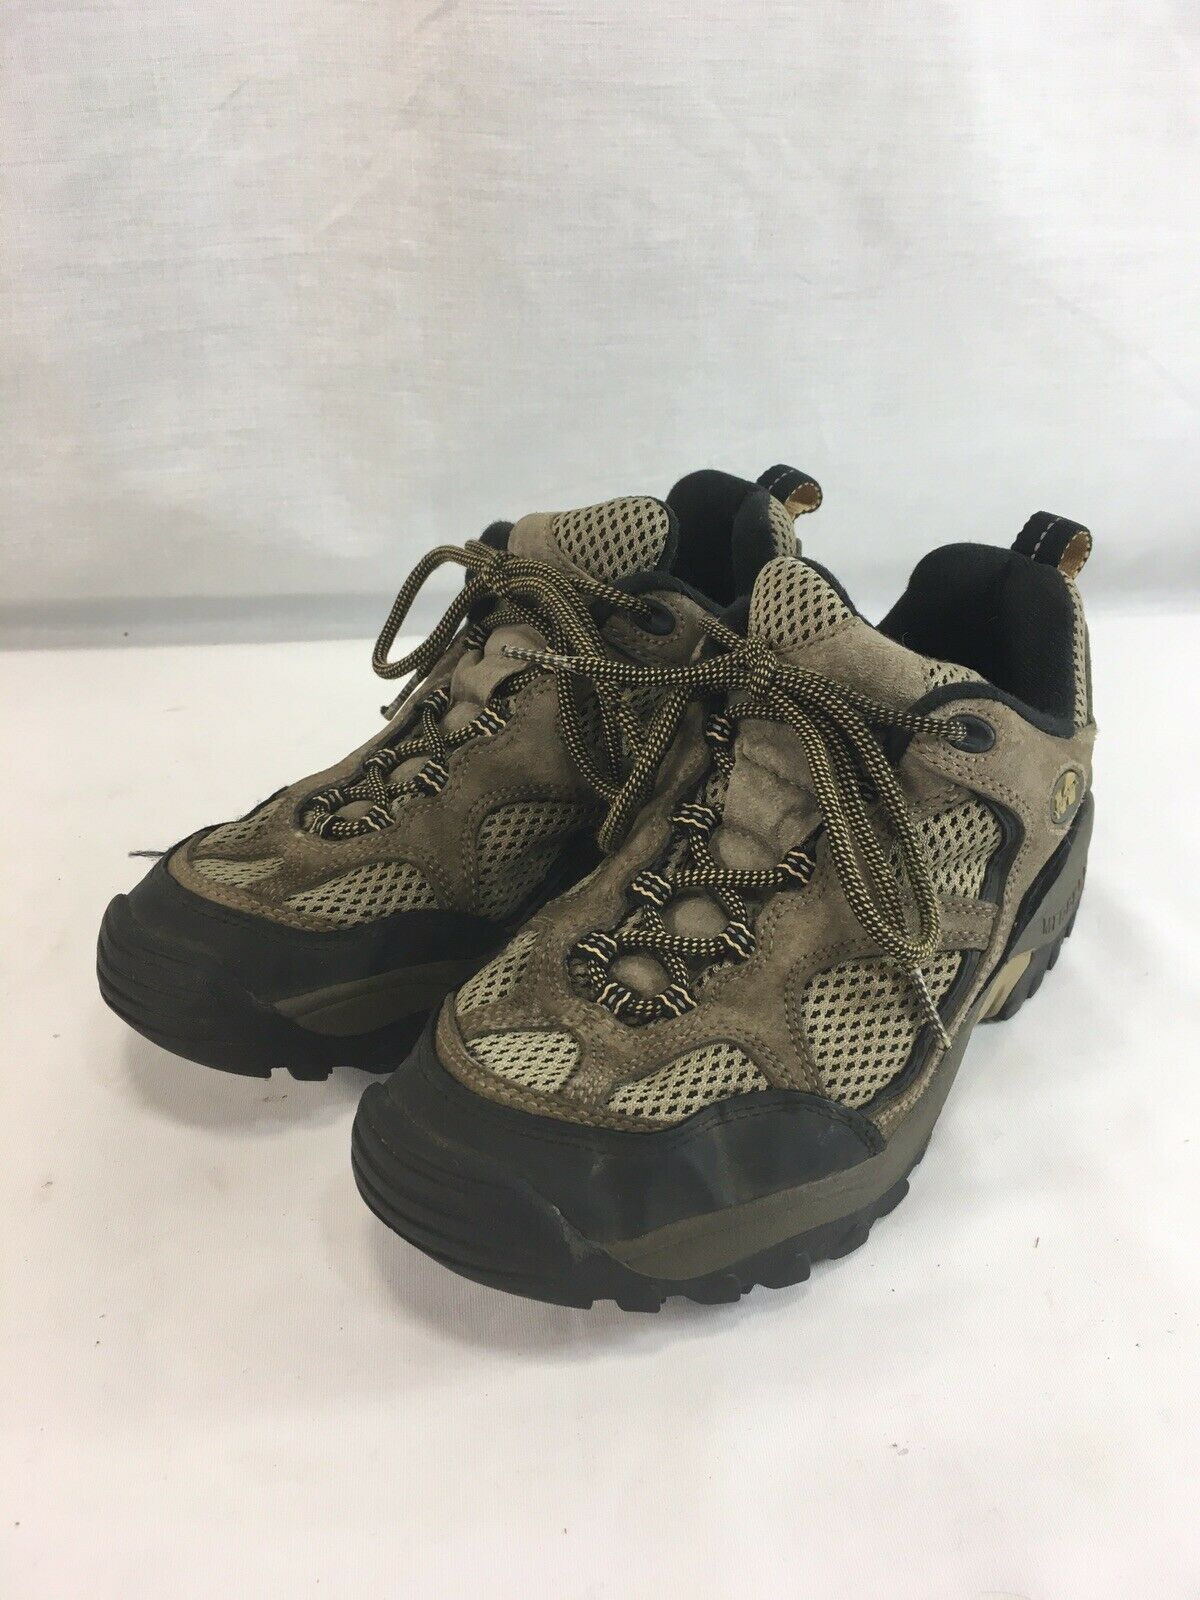 Merrell Hiking Trail scarpe da ginnastica scarpe donna 7.5 Baja Ventilator Walnut Low Top